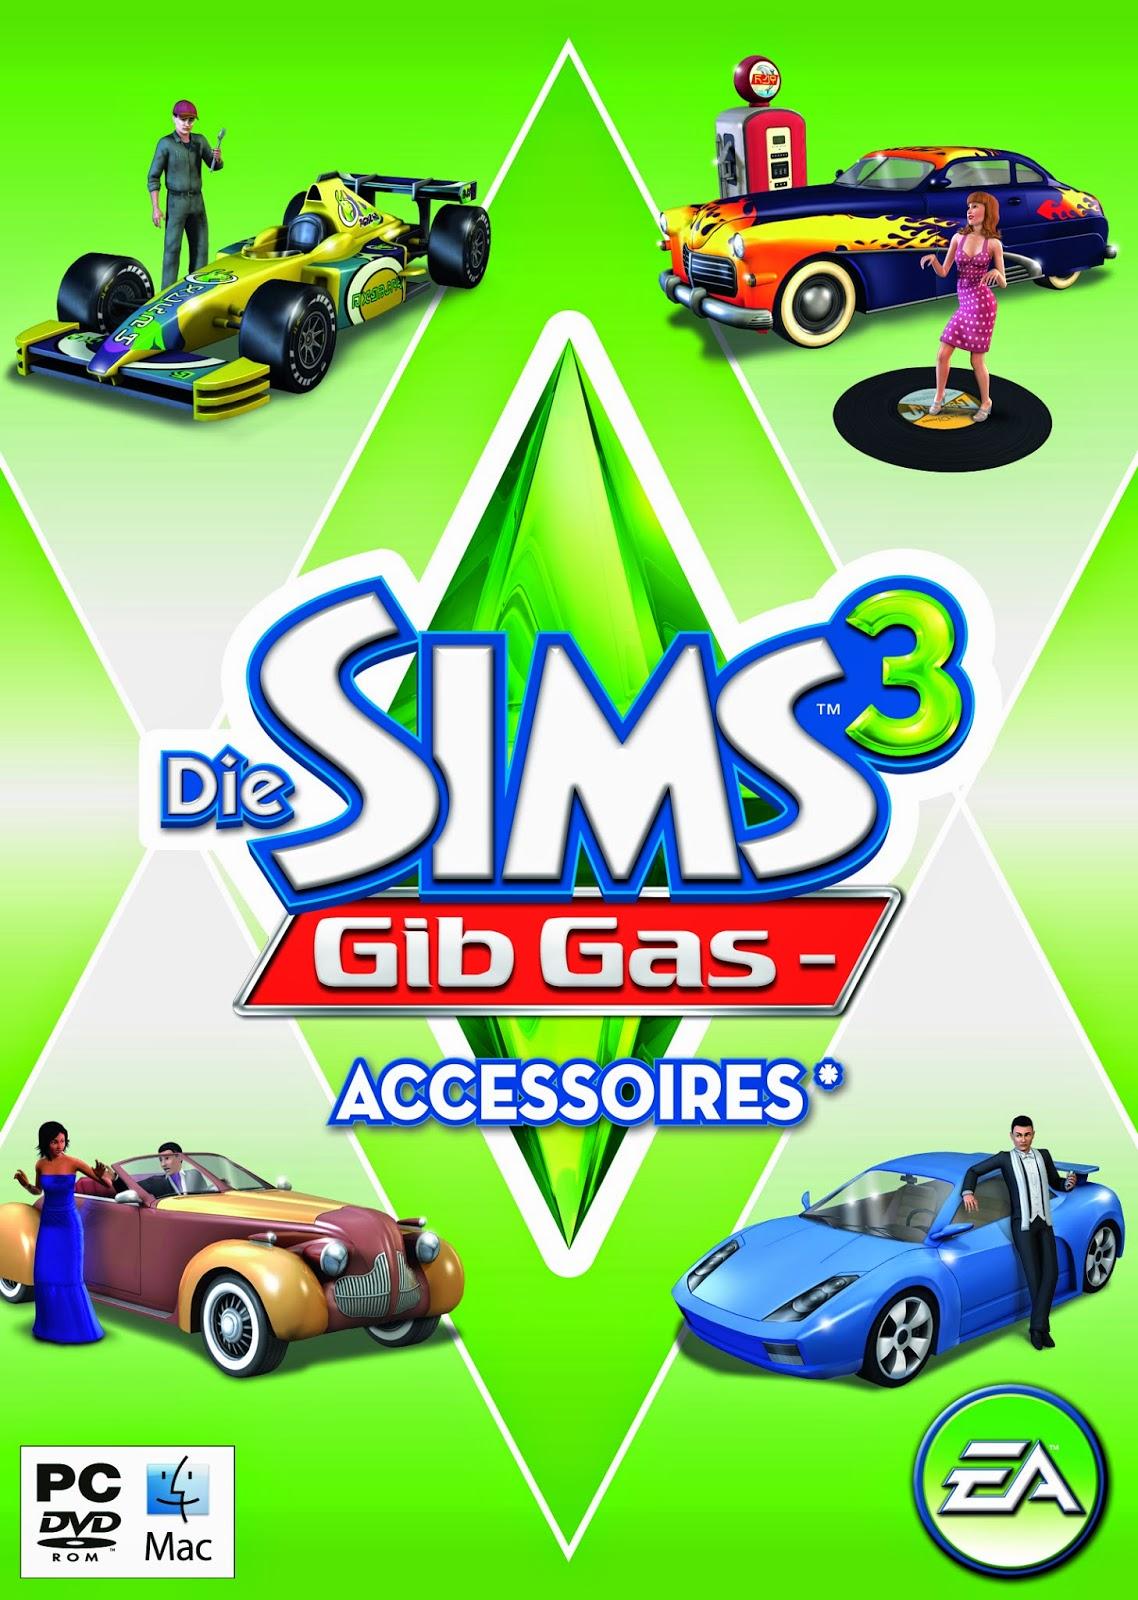 http://www.amazon.de/Die-Sims-Gib-Gas-Accessoires/dp/B003V8AOL8/ref=sr_1_2?ie=UTF8&qid=1405947967&sr=8-2&keywords=Die+Sims+3+-+Gib+Gas-Accessoires